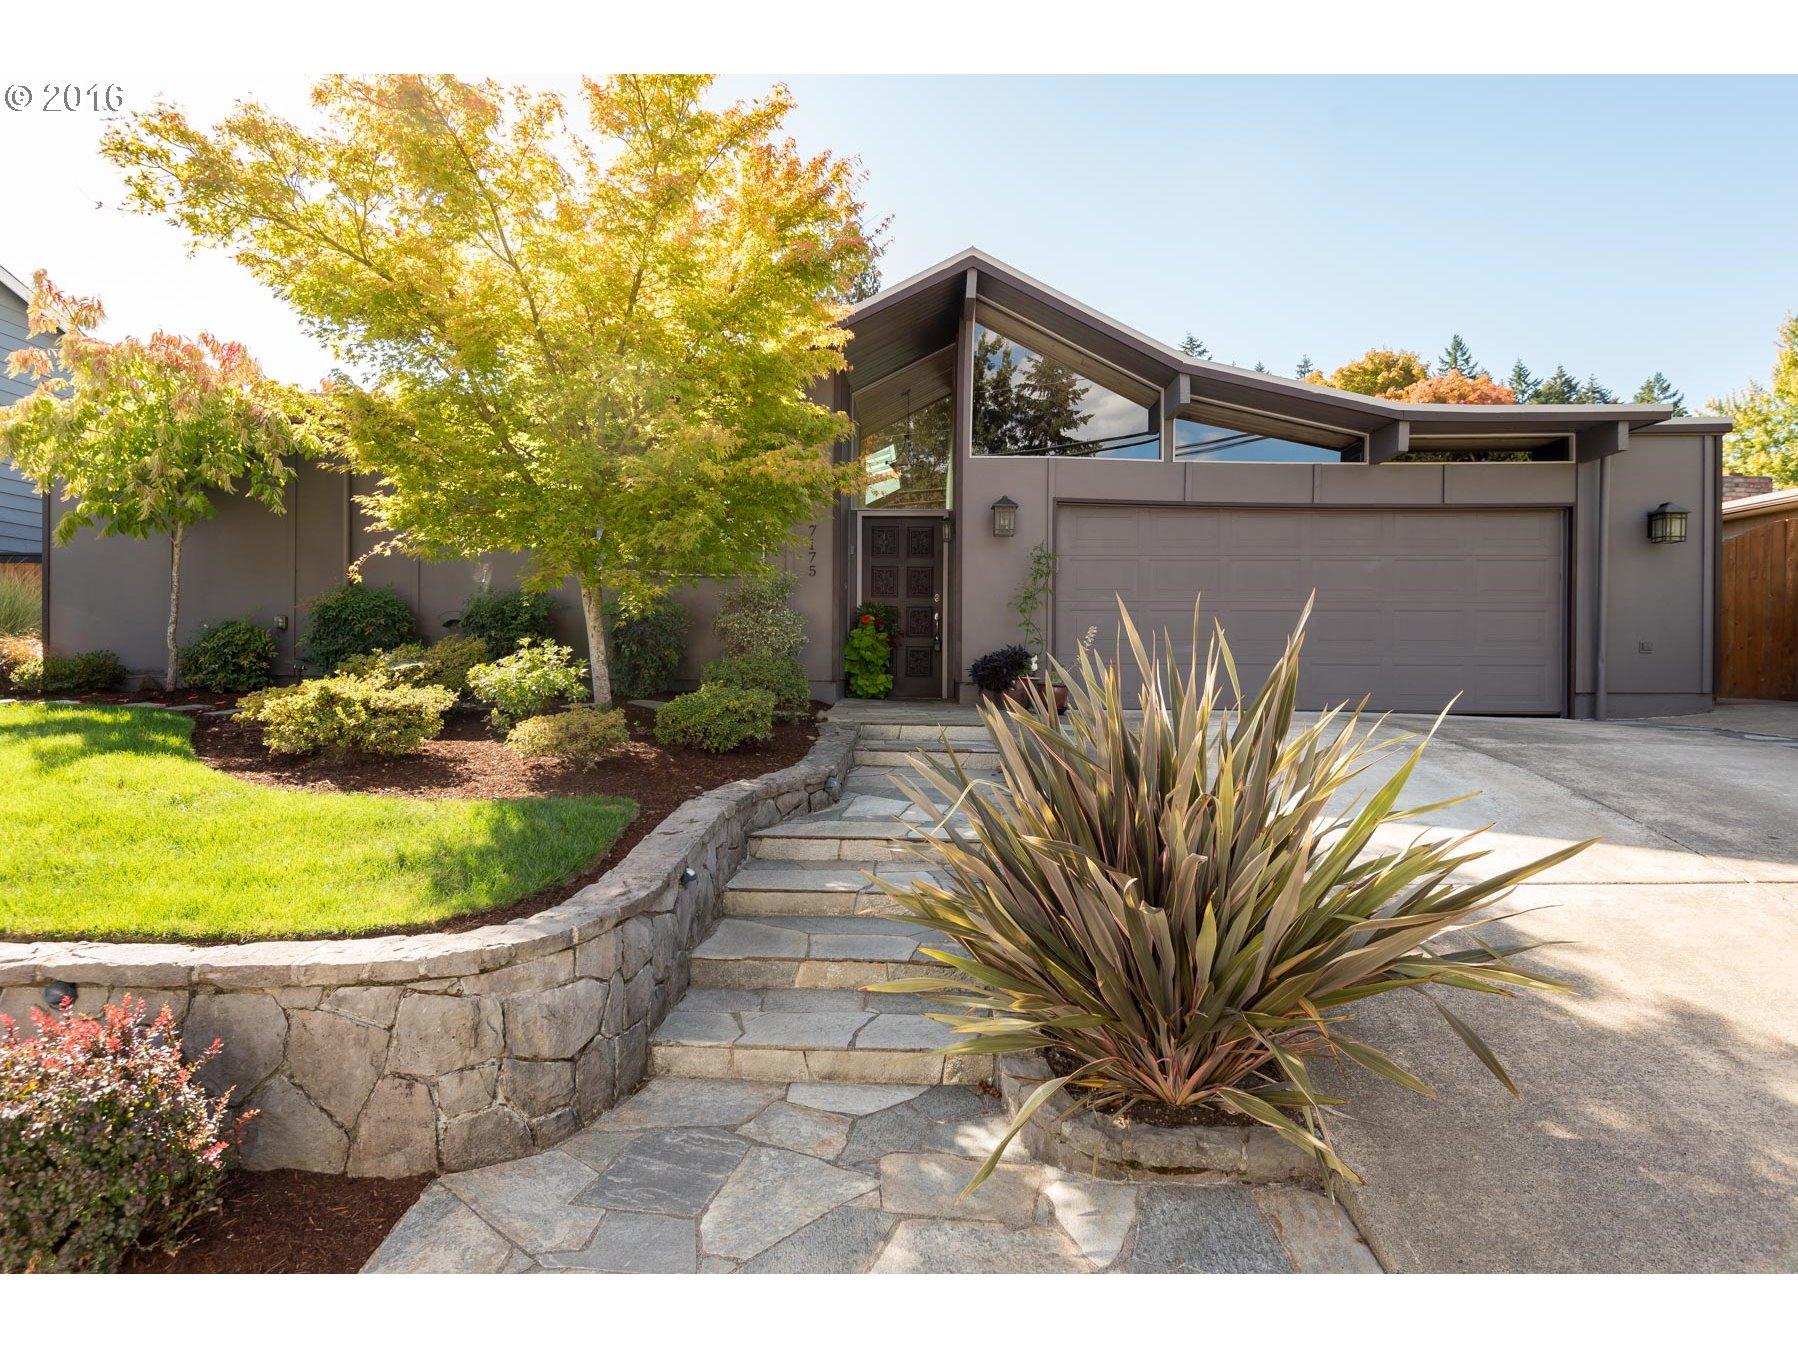 $550,000 - 4Br/2Ba -  for Sale in Beaverton